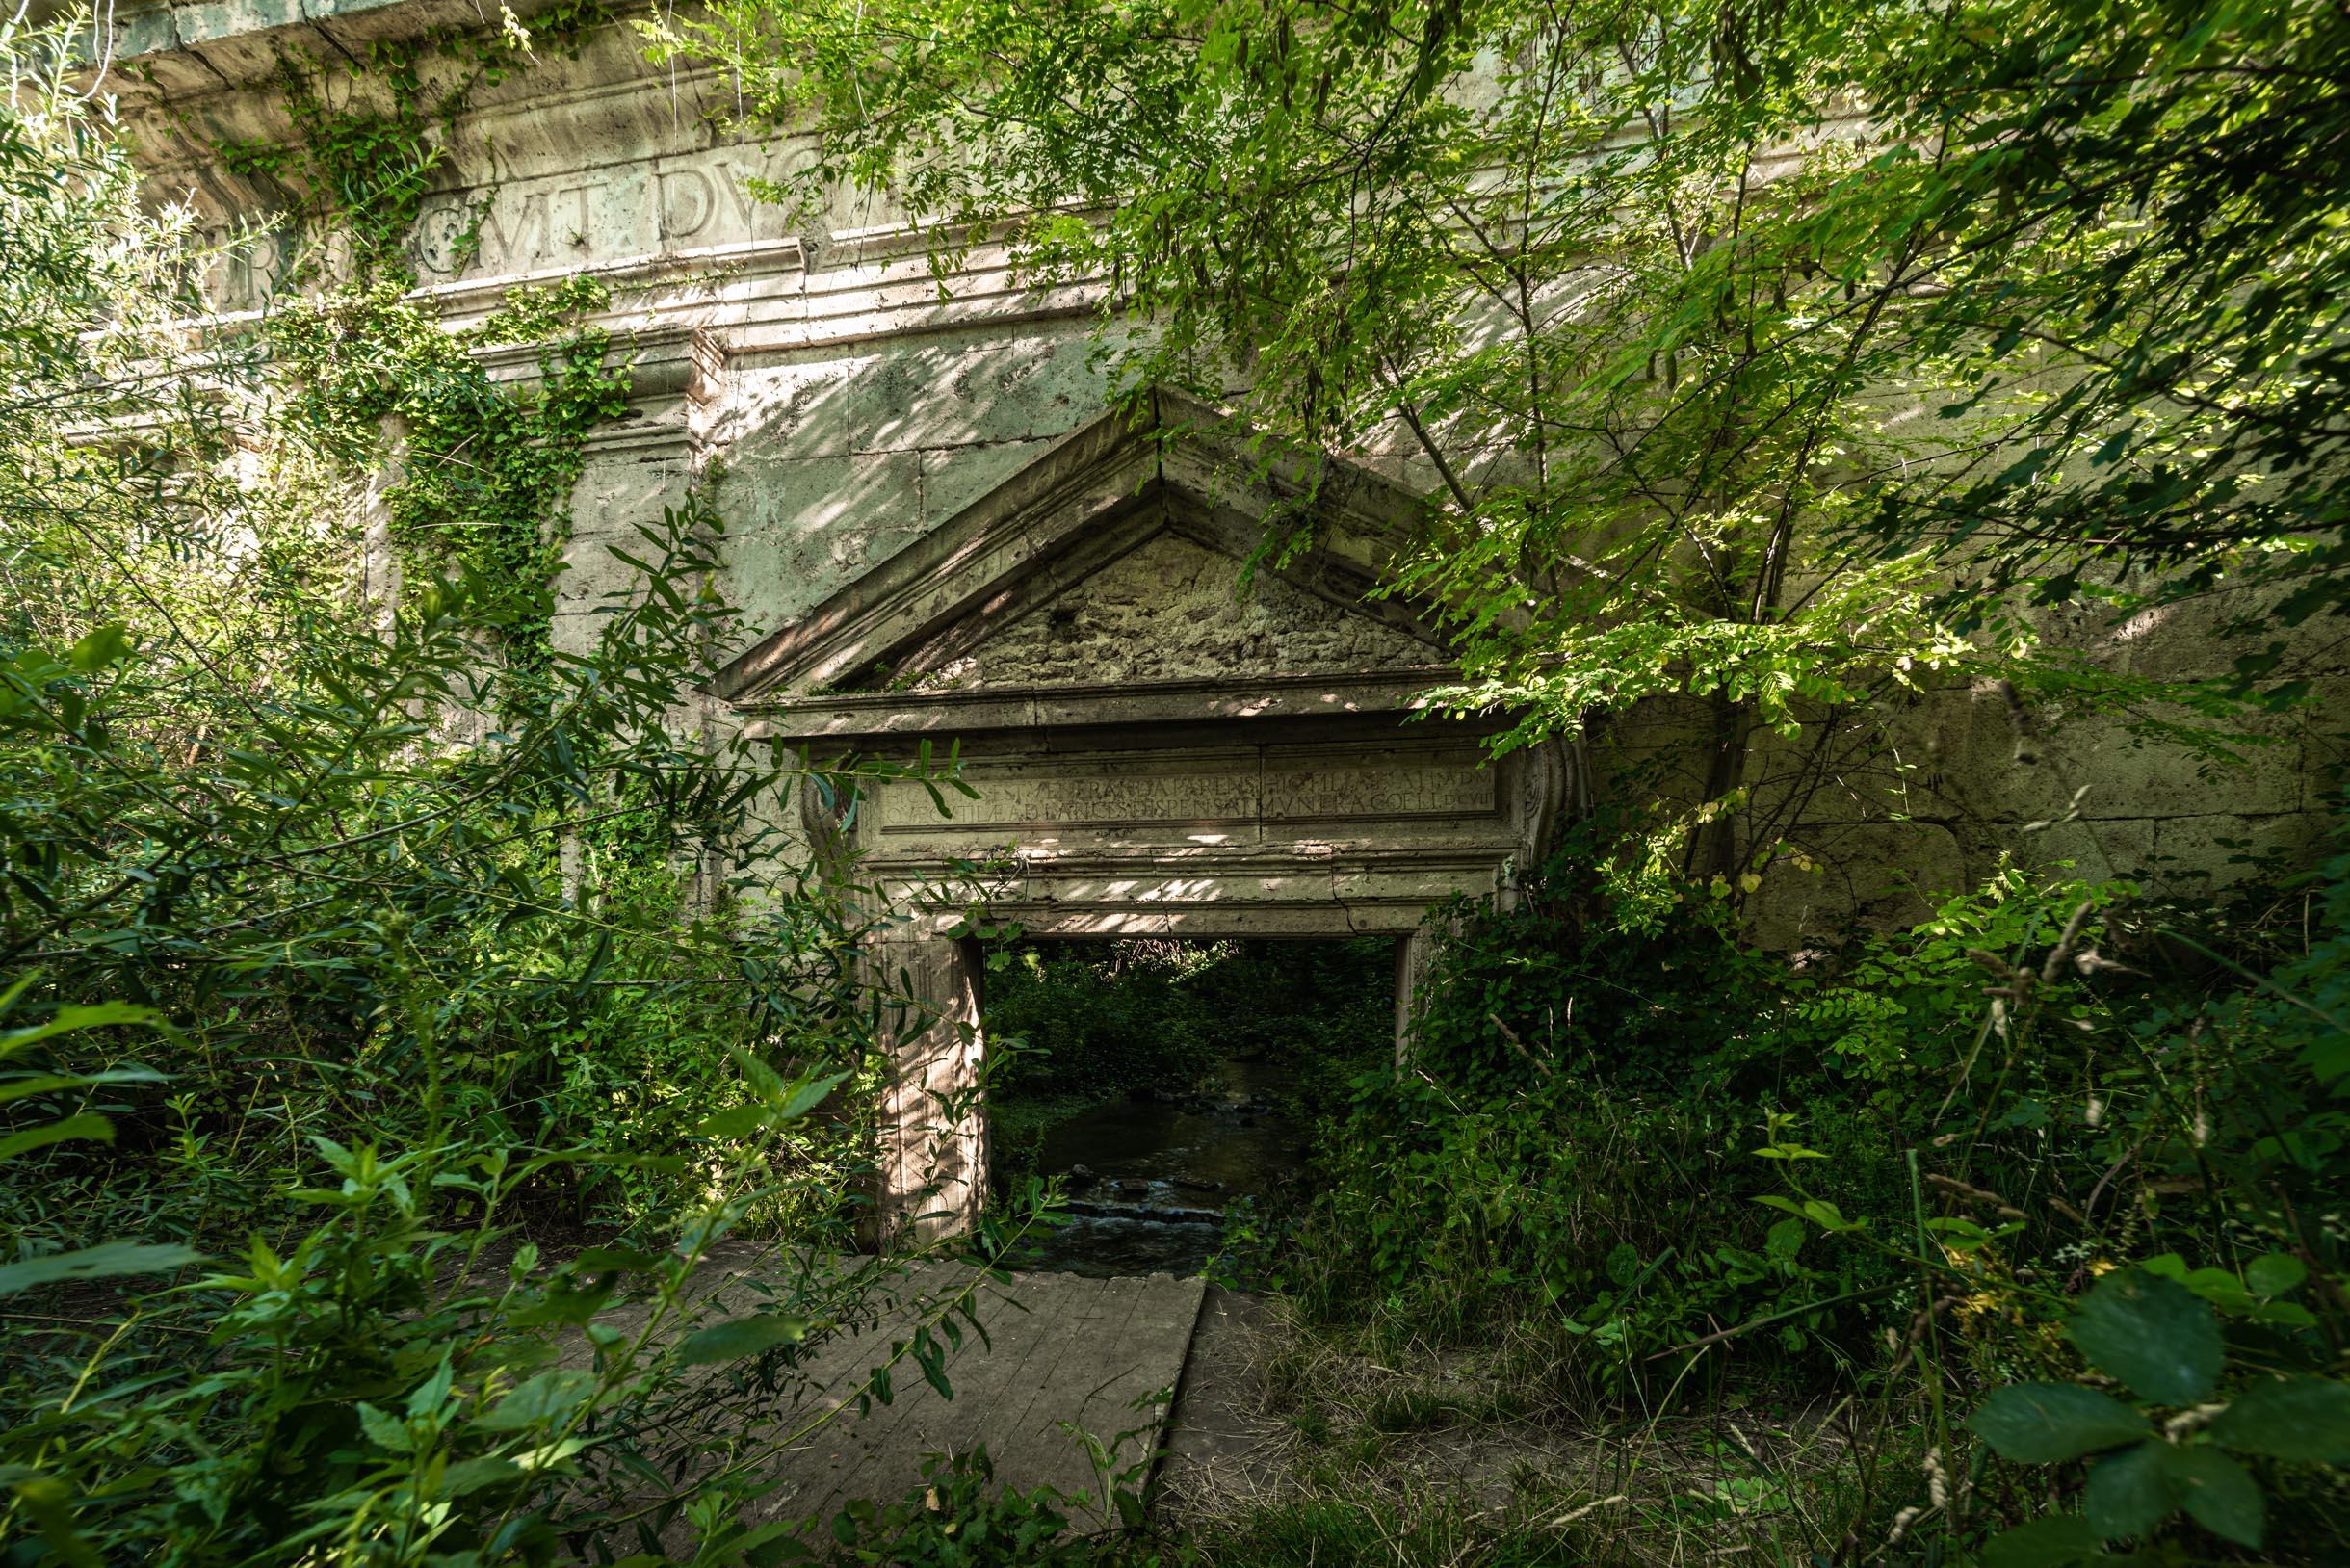 The Sinking Church